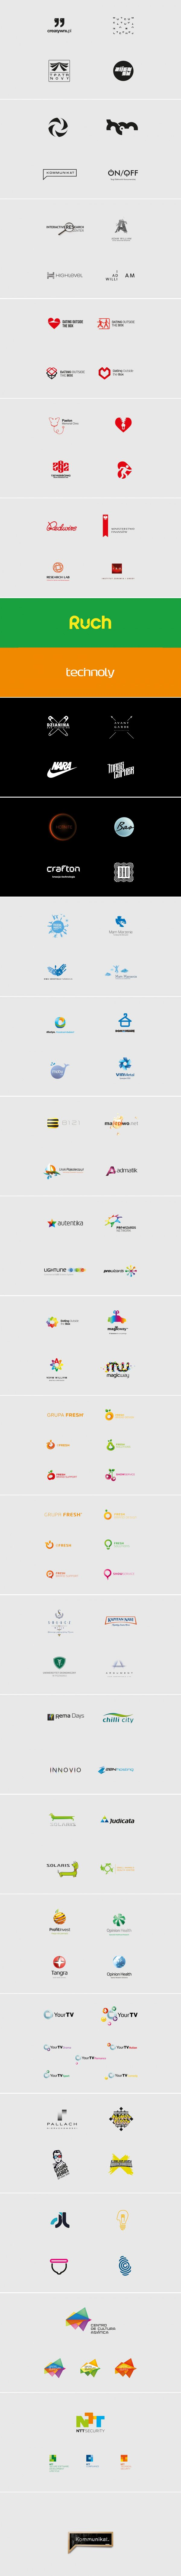 Logotheka contain concepts from 2006-2011. Selected logos designed by Kuba Enzowski.  Kommunikat